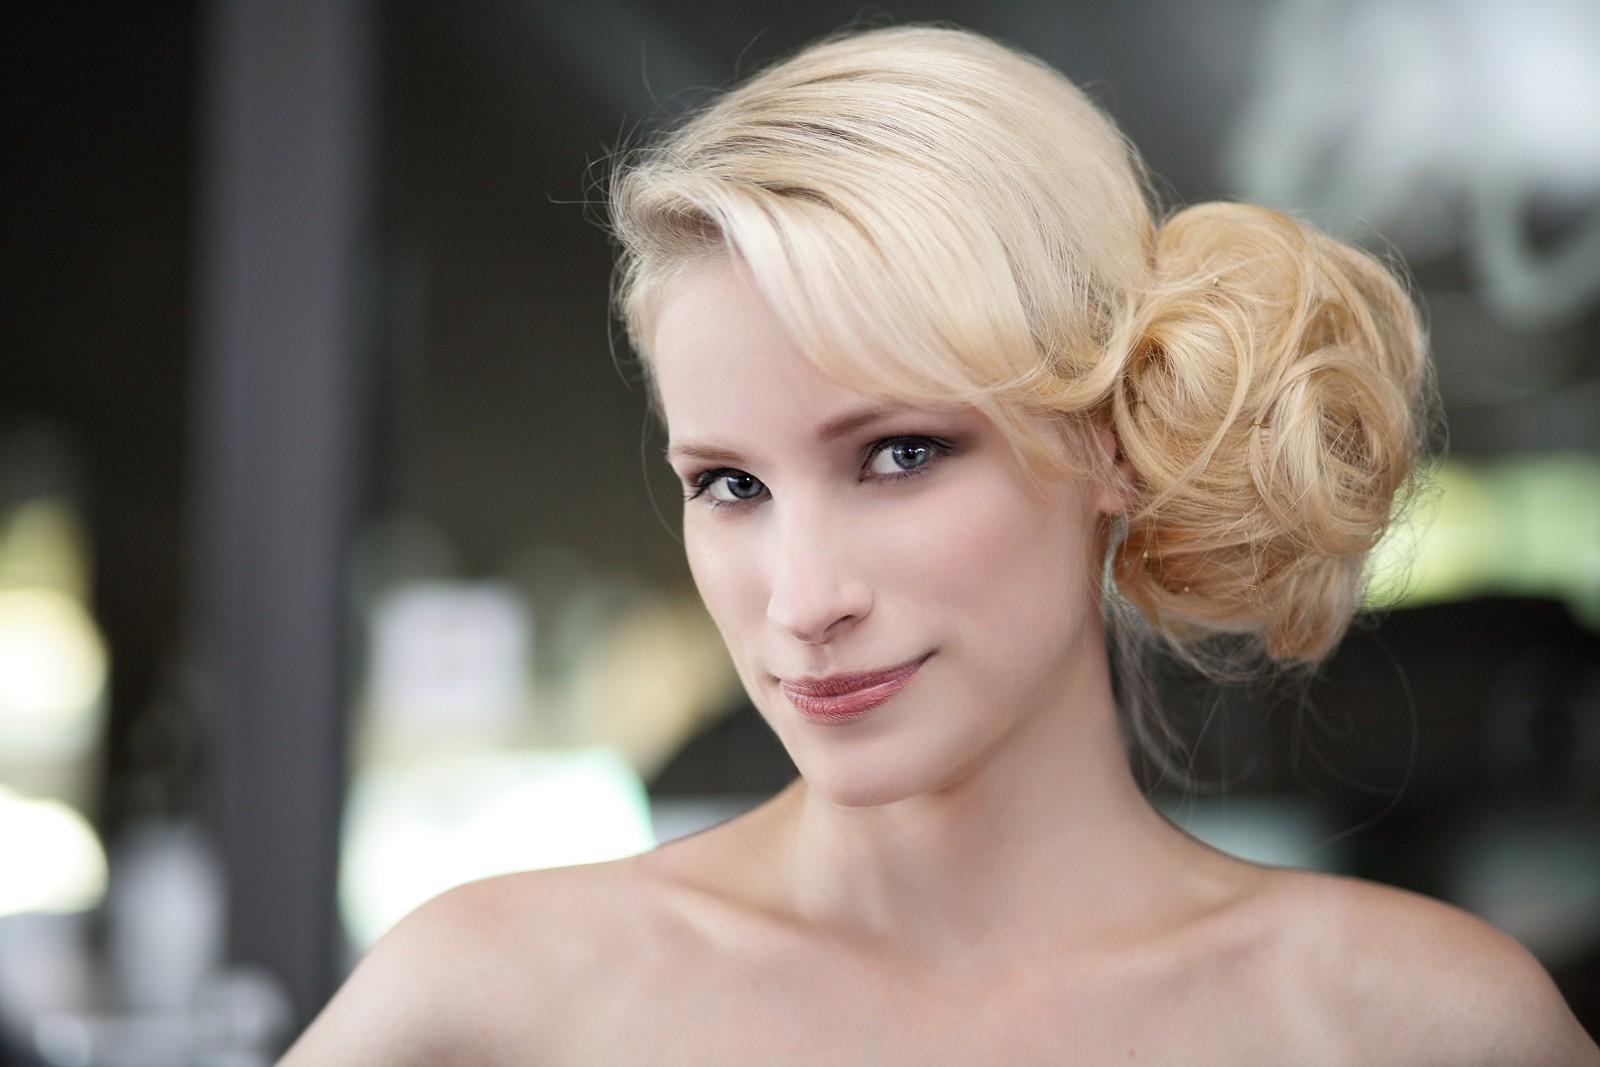 gd_5716-BerlinWalkOfFash2014 - Eliyzi Couture - Jane Shoe_pp